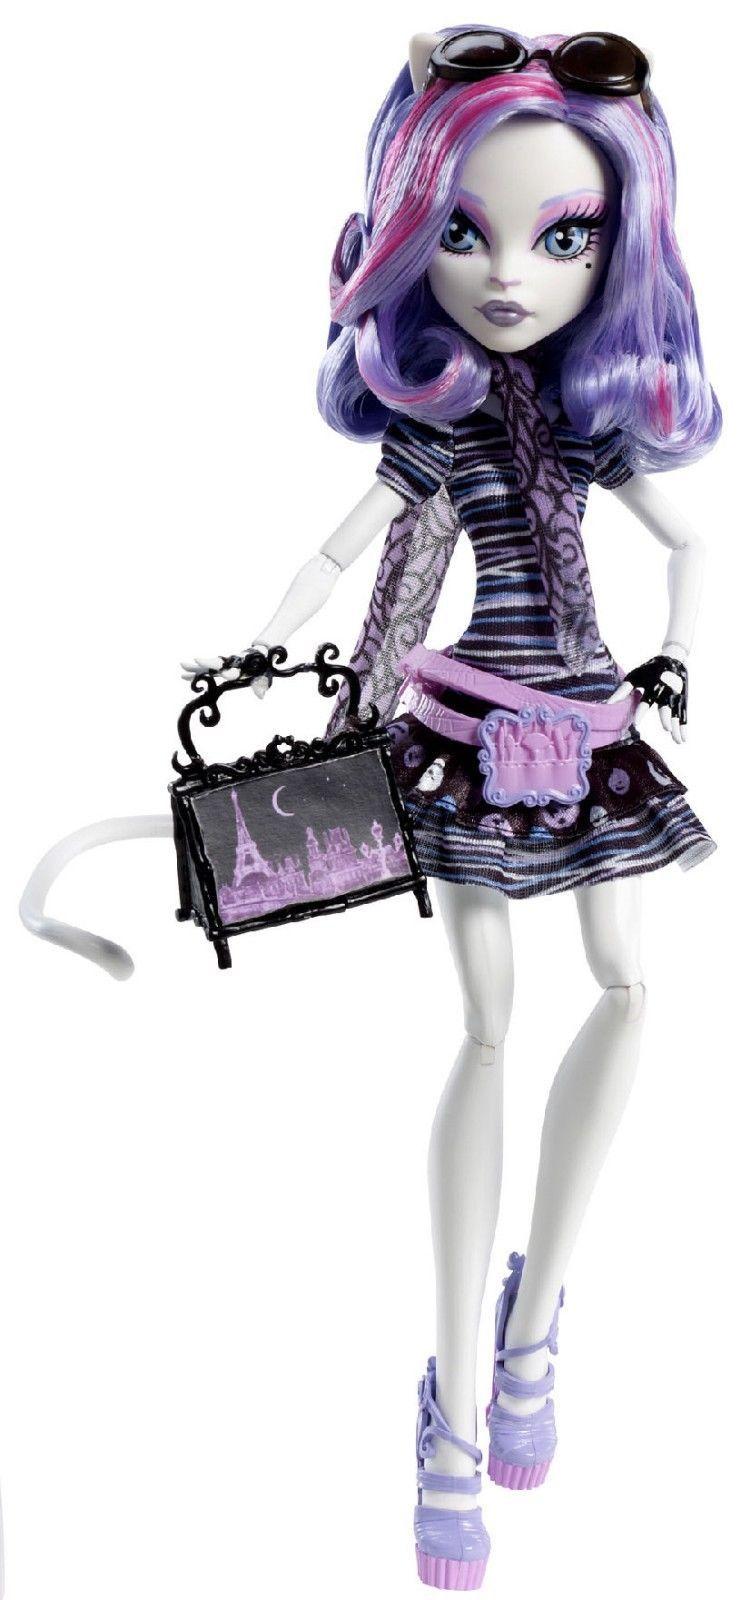 Catrine demew popular catrine demew doll buy cheap catrine demew doll - Monster High Loose Scaris Catrine Demew Daughter Of A Werecat Ebay